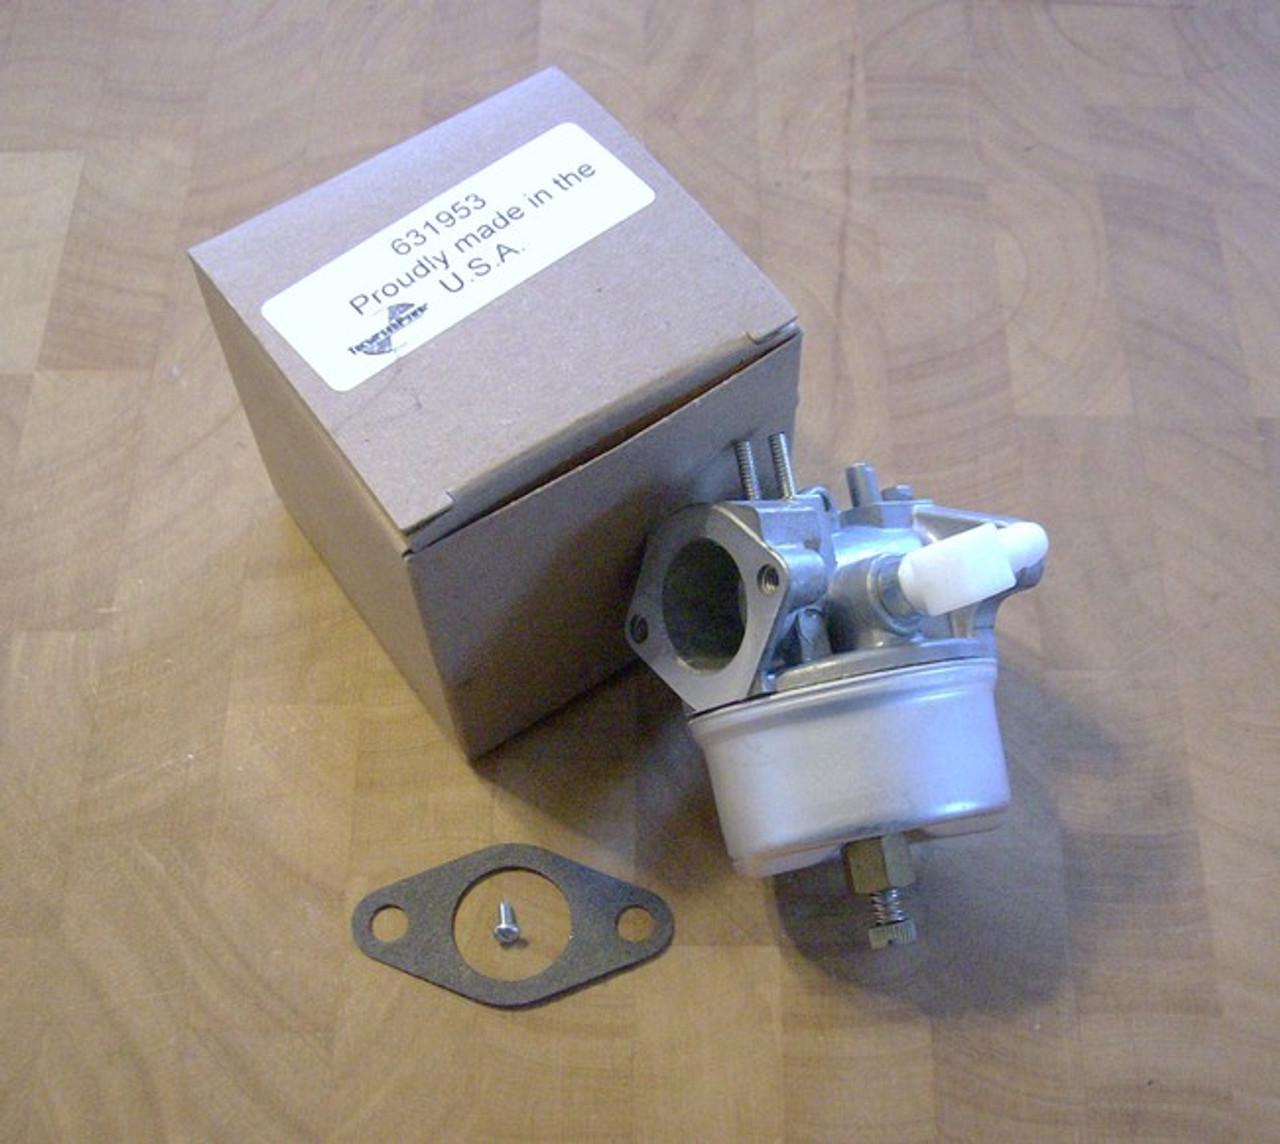 Carburetor for Tecumseh HS50, 631953, 631914, 631704